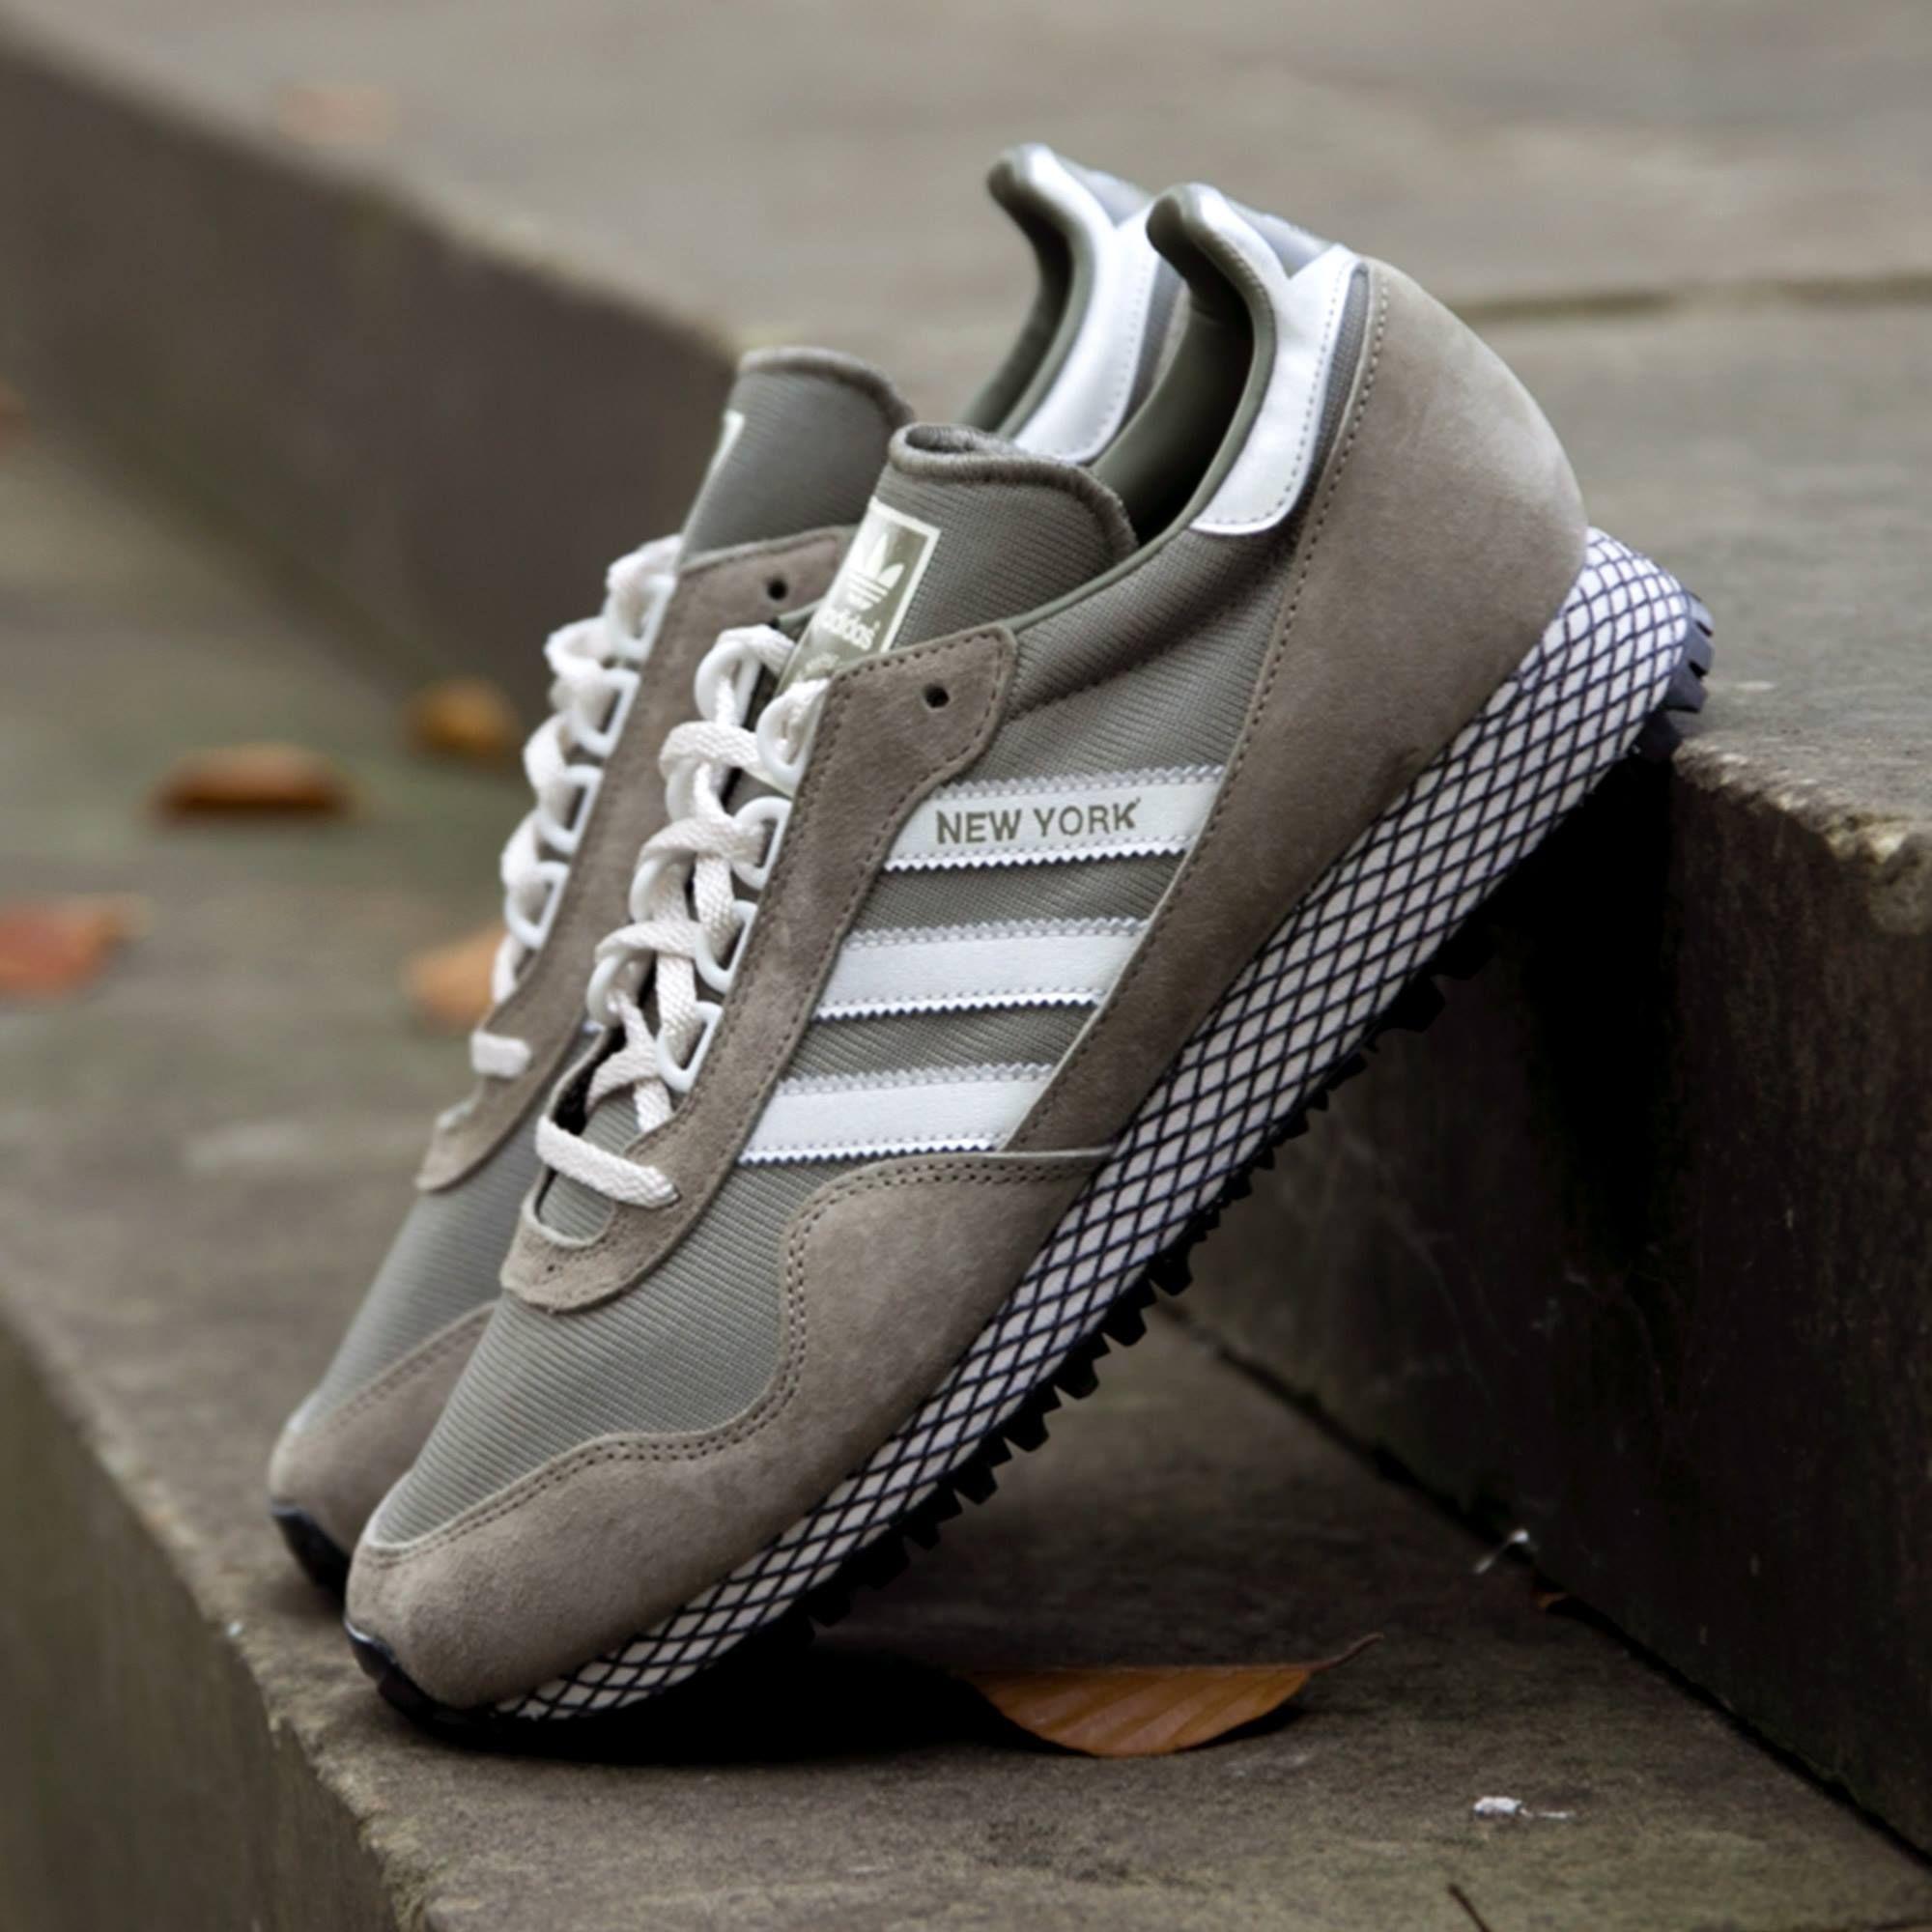 adidas new york vintage